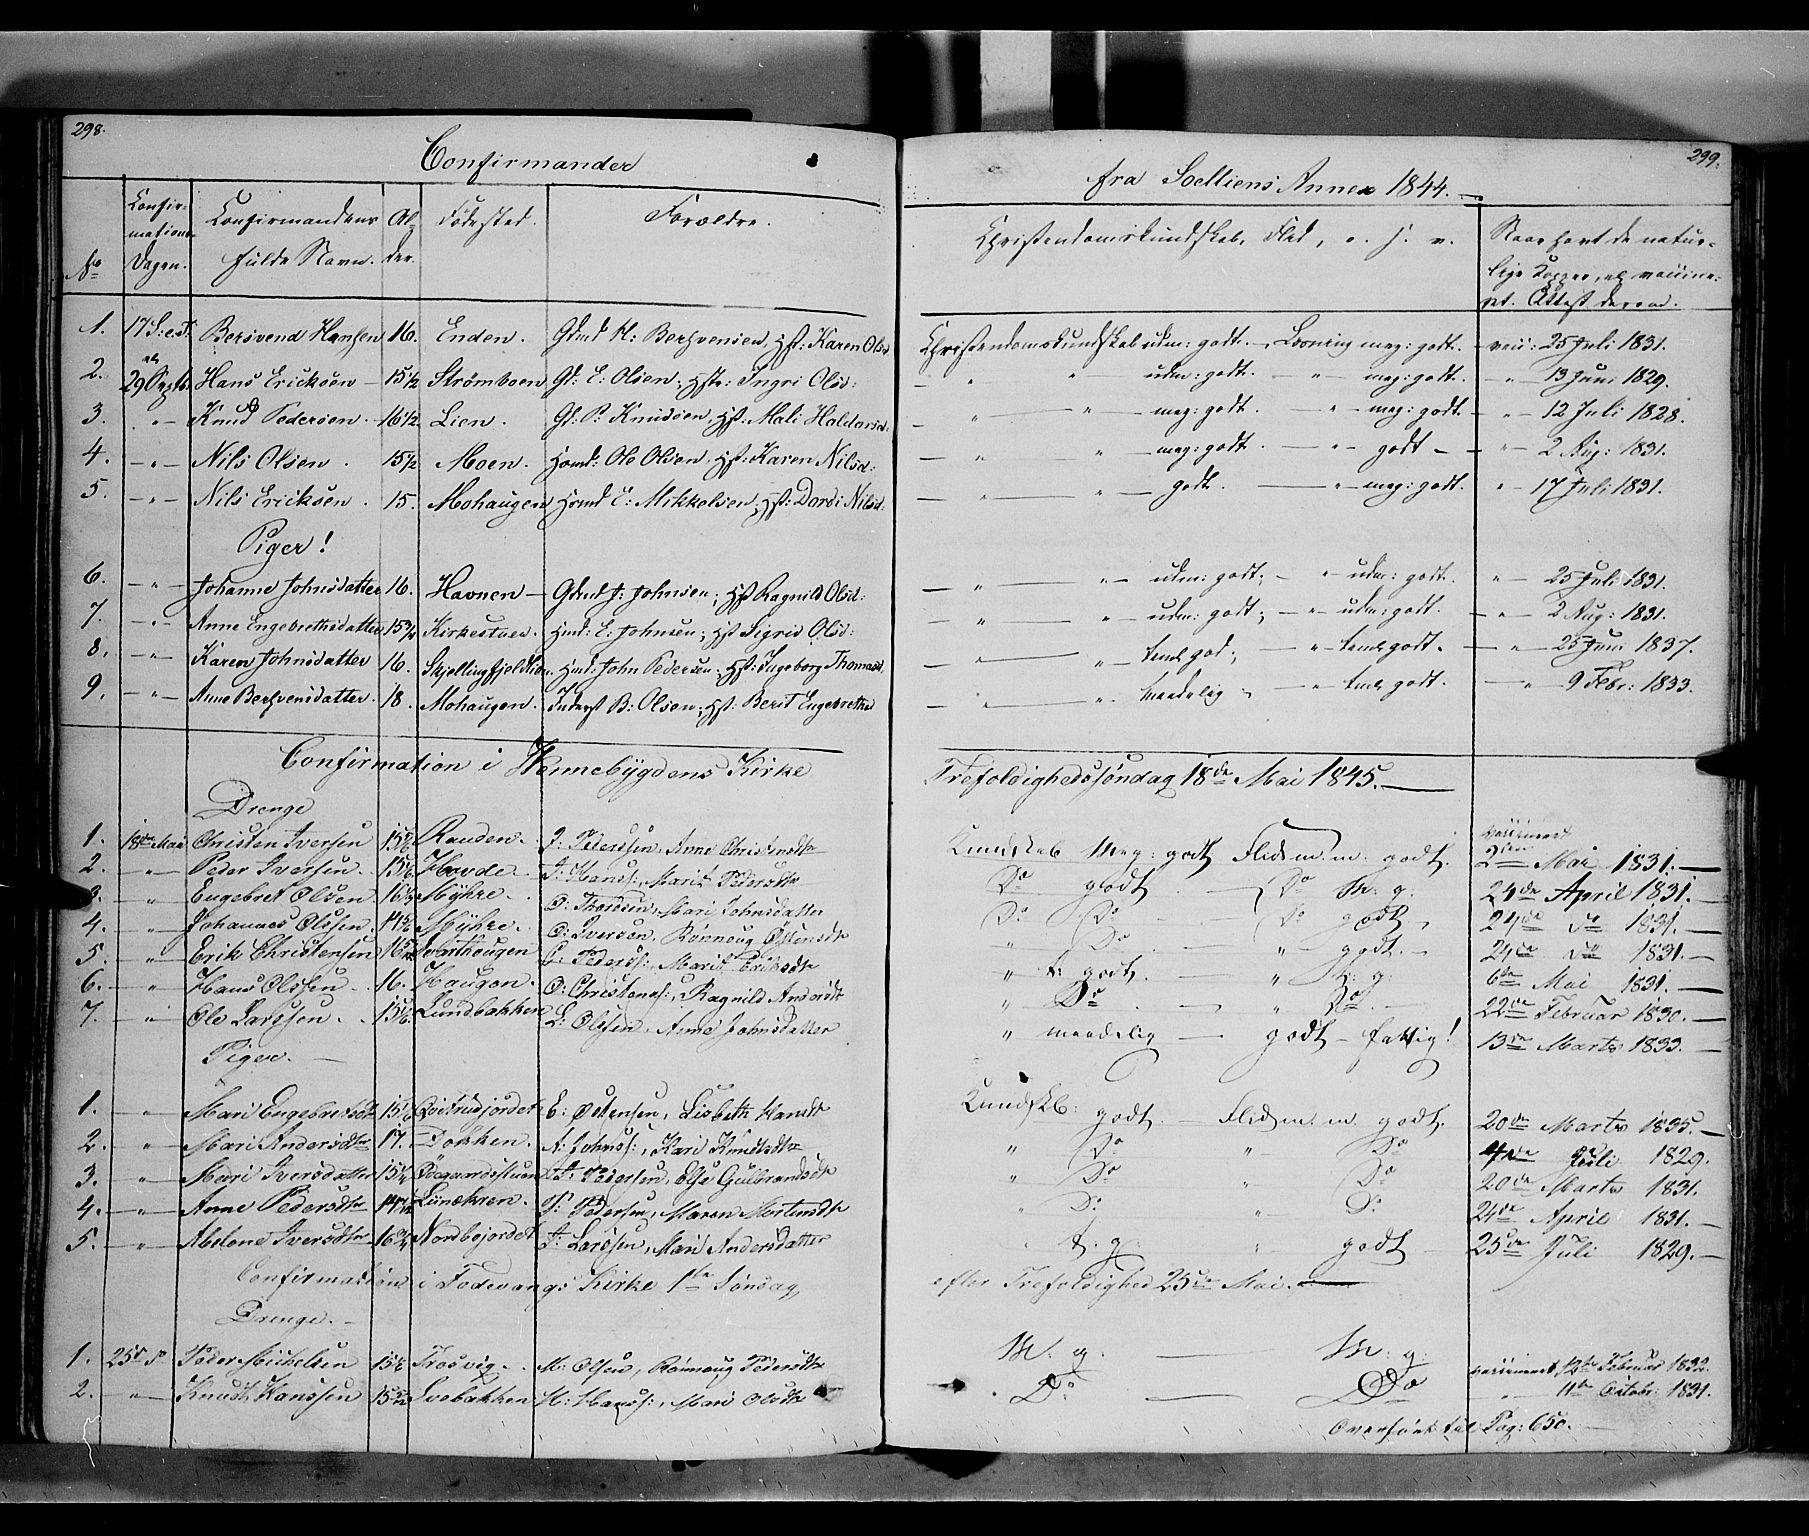 SAH, Ringebu prestekontor, Ministerialbok nr. 5, 1839-1848, s. 298-299